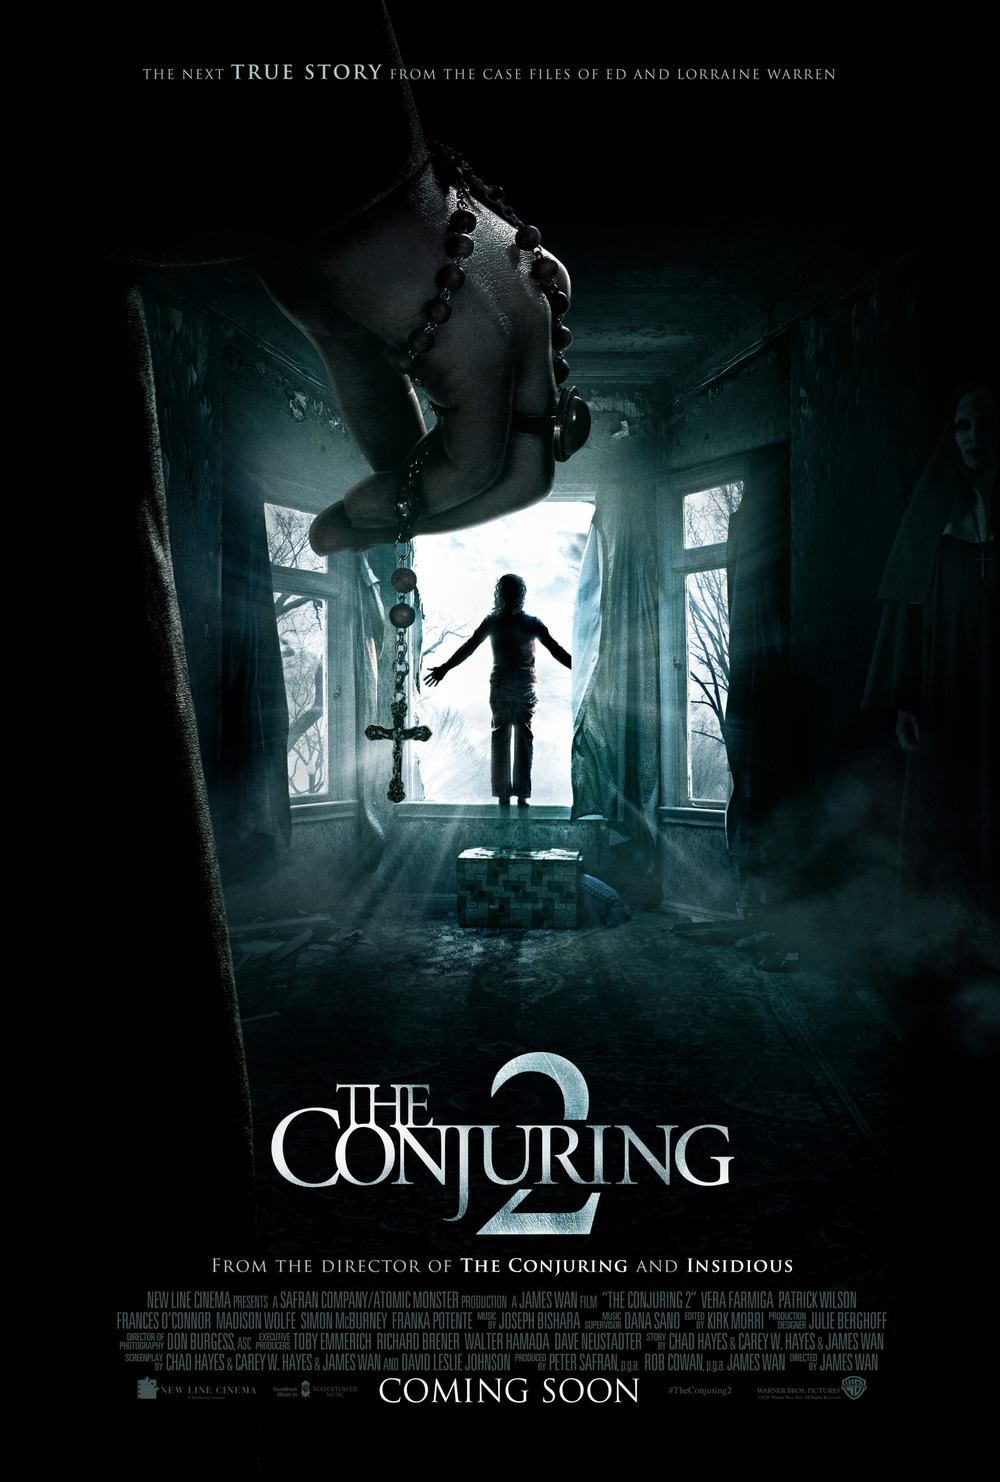 Conjuring 2 release date in Sydney